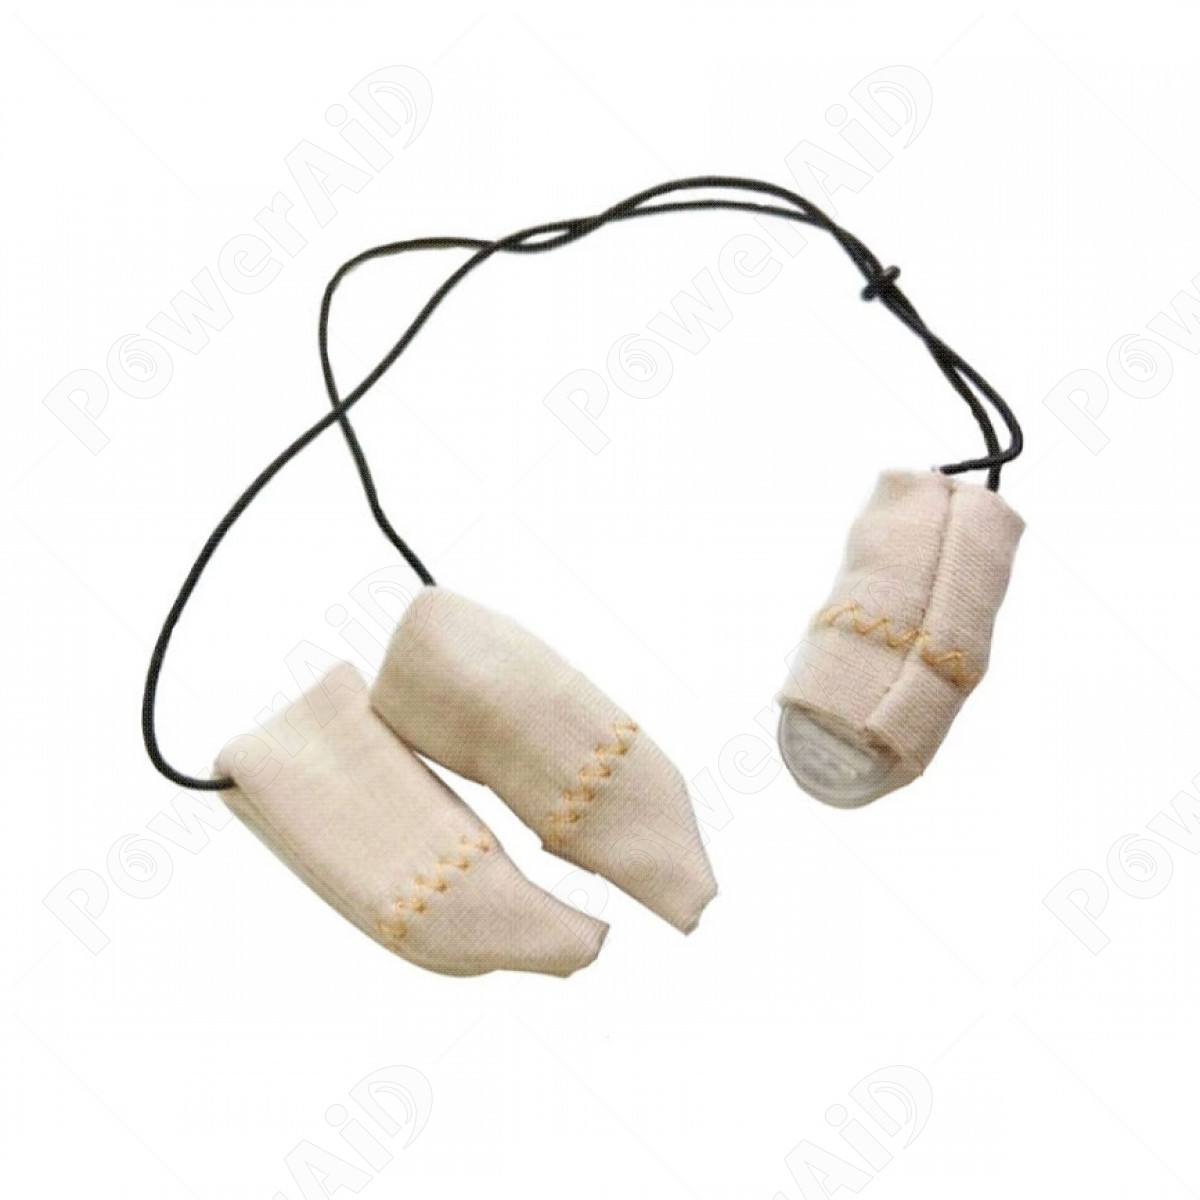 Soundlink - BTE Clip protezione polvere, sudore e anticaduta Panna